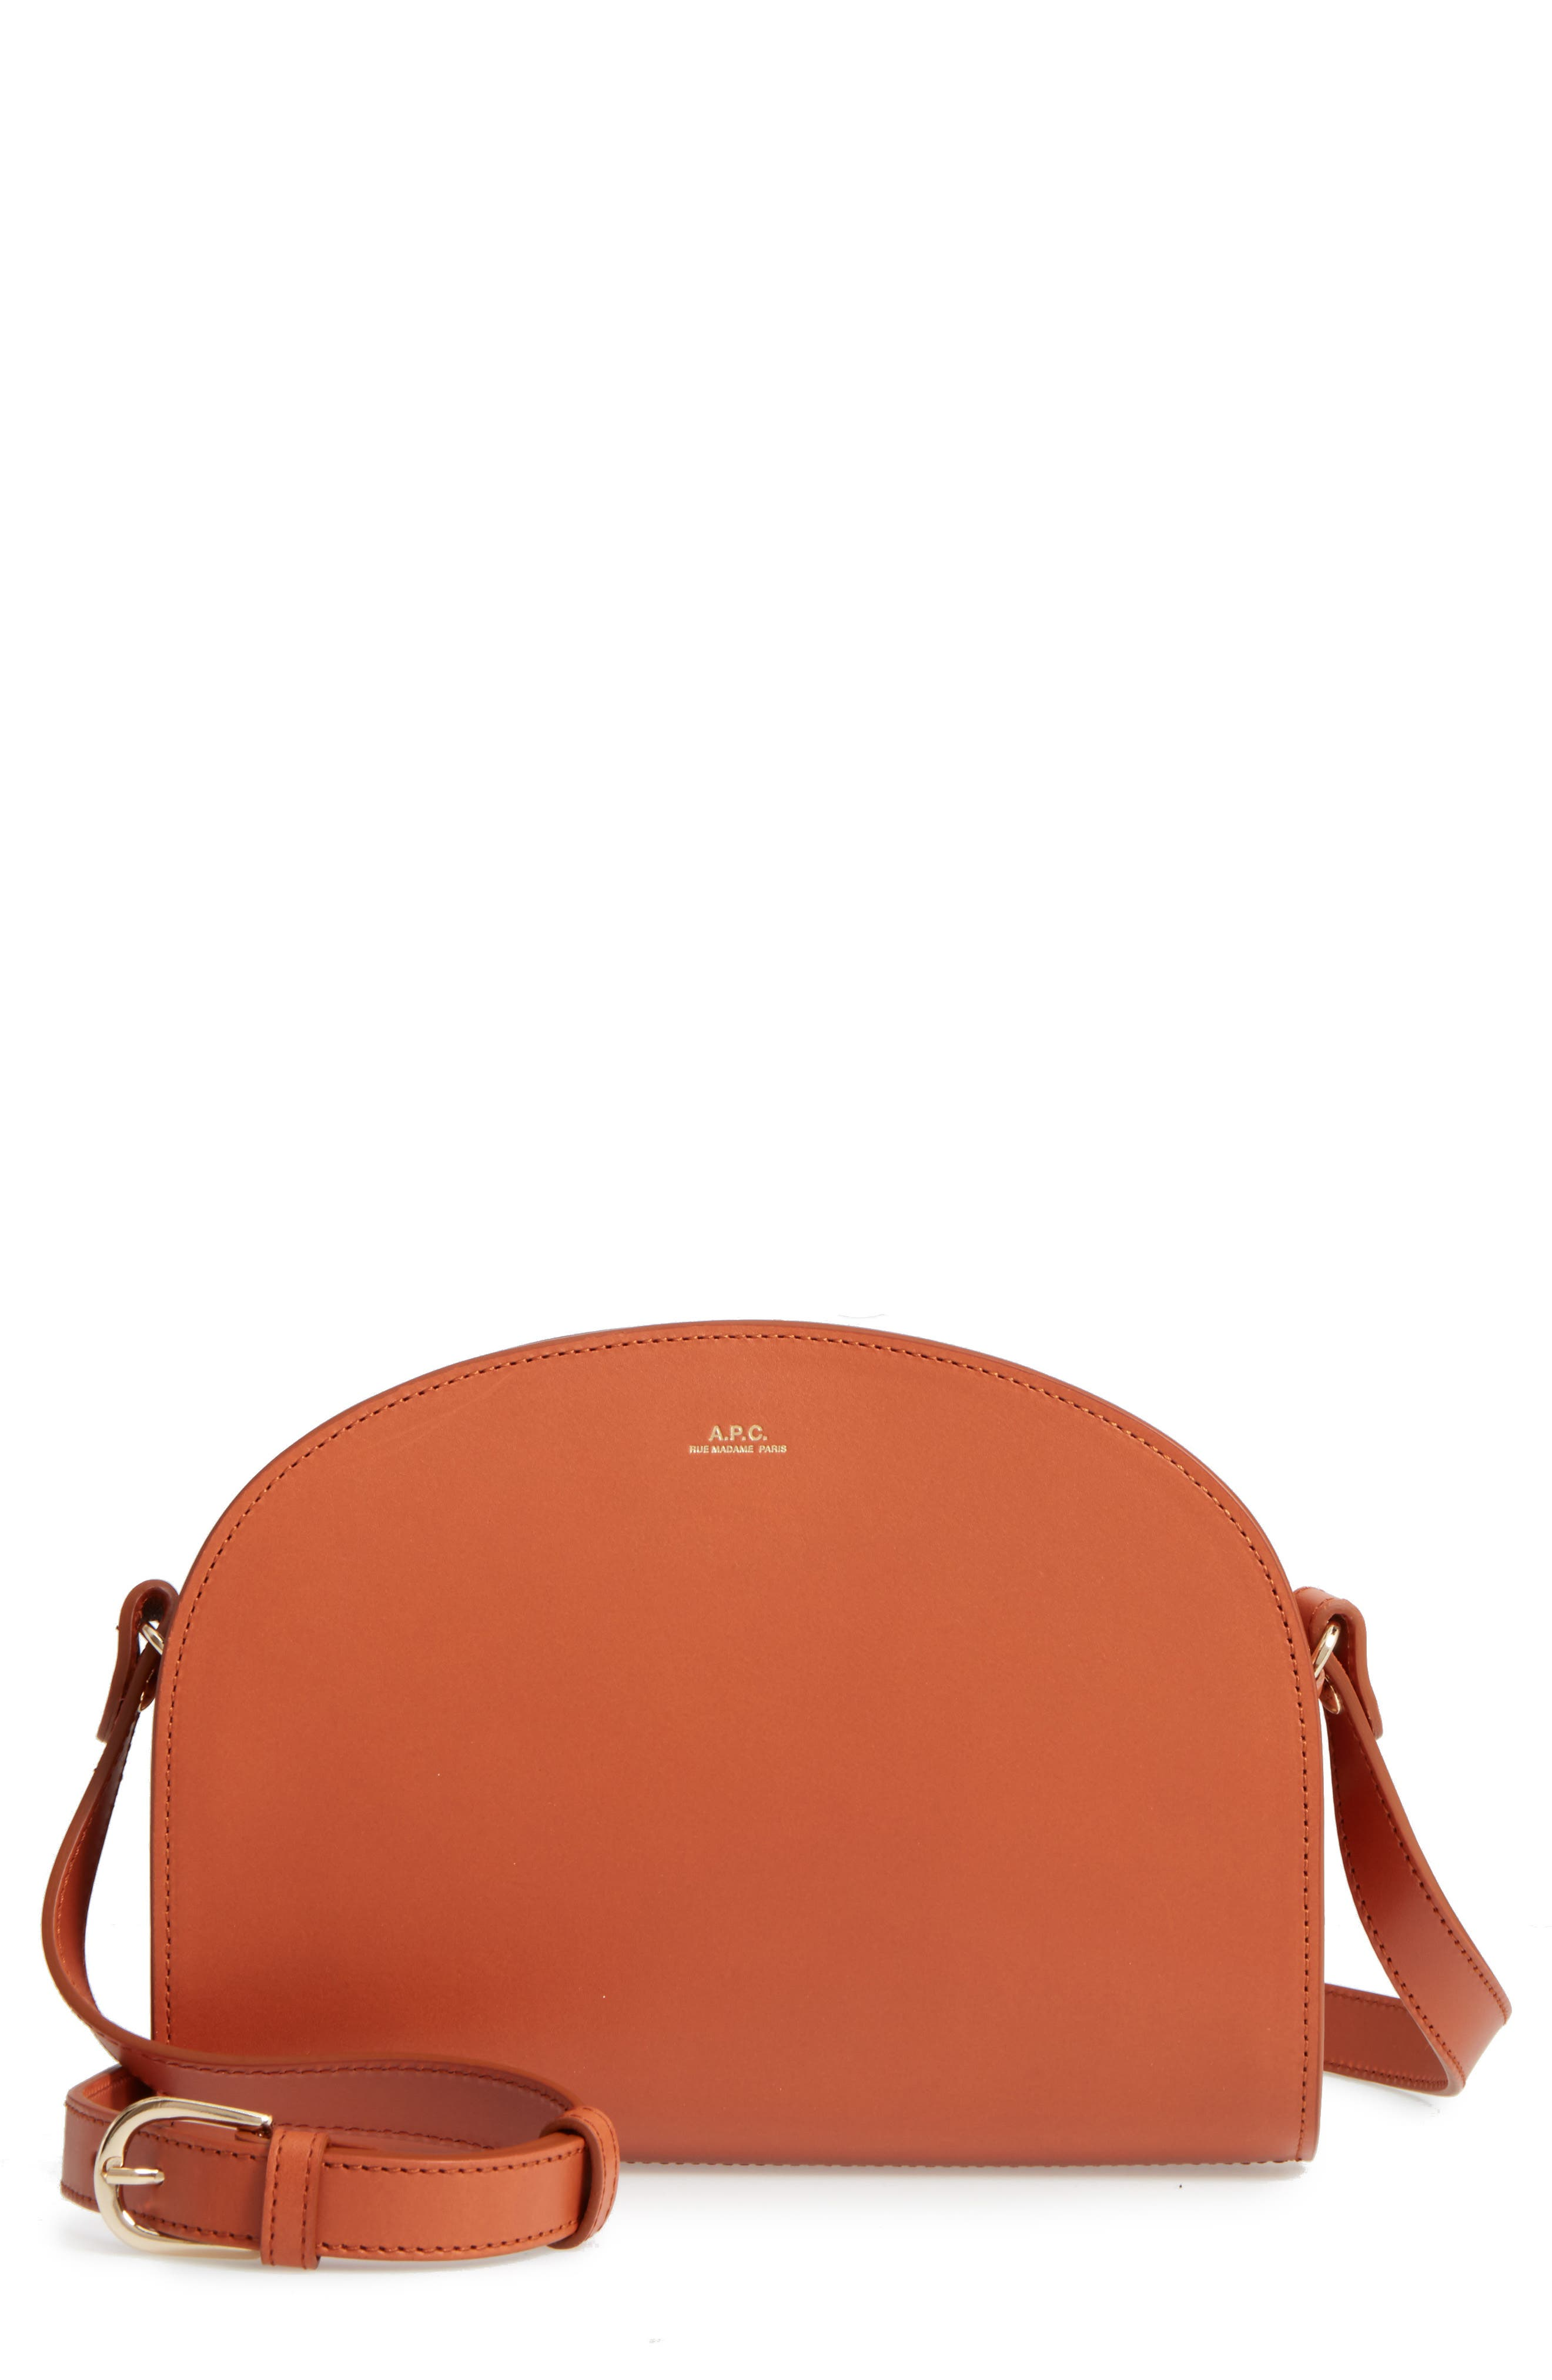 Sac Demi Lune Leather Crossbody Bag,                         Main,                         color, Caramel